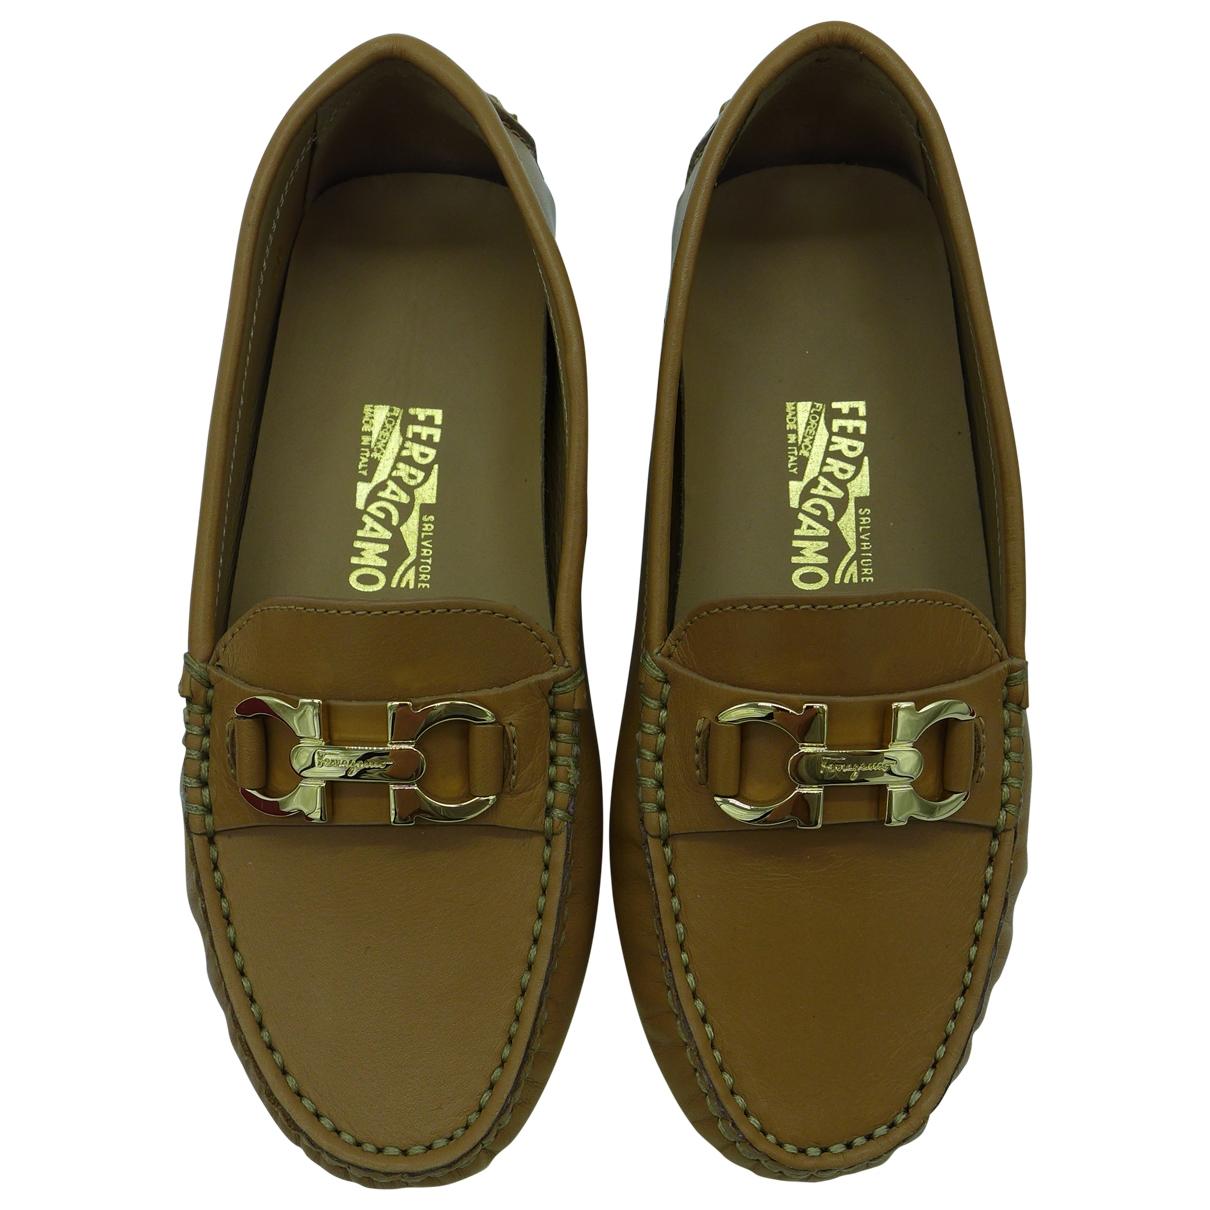 Salvatore Ferragamo \N Brown Leather Flats for Kids 28 EU